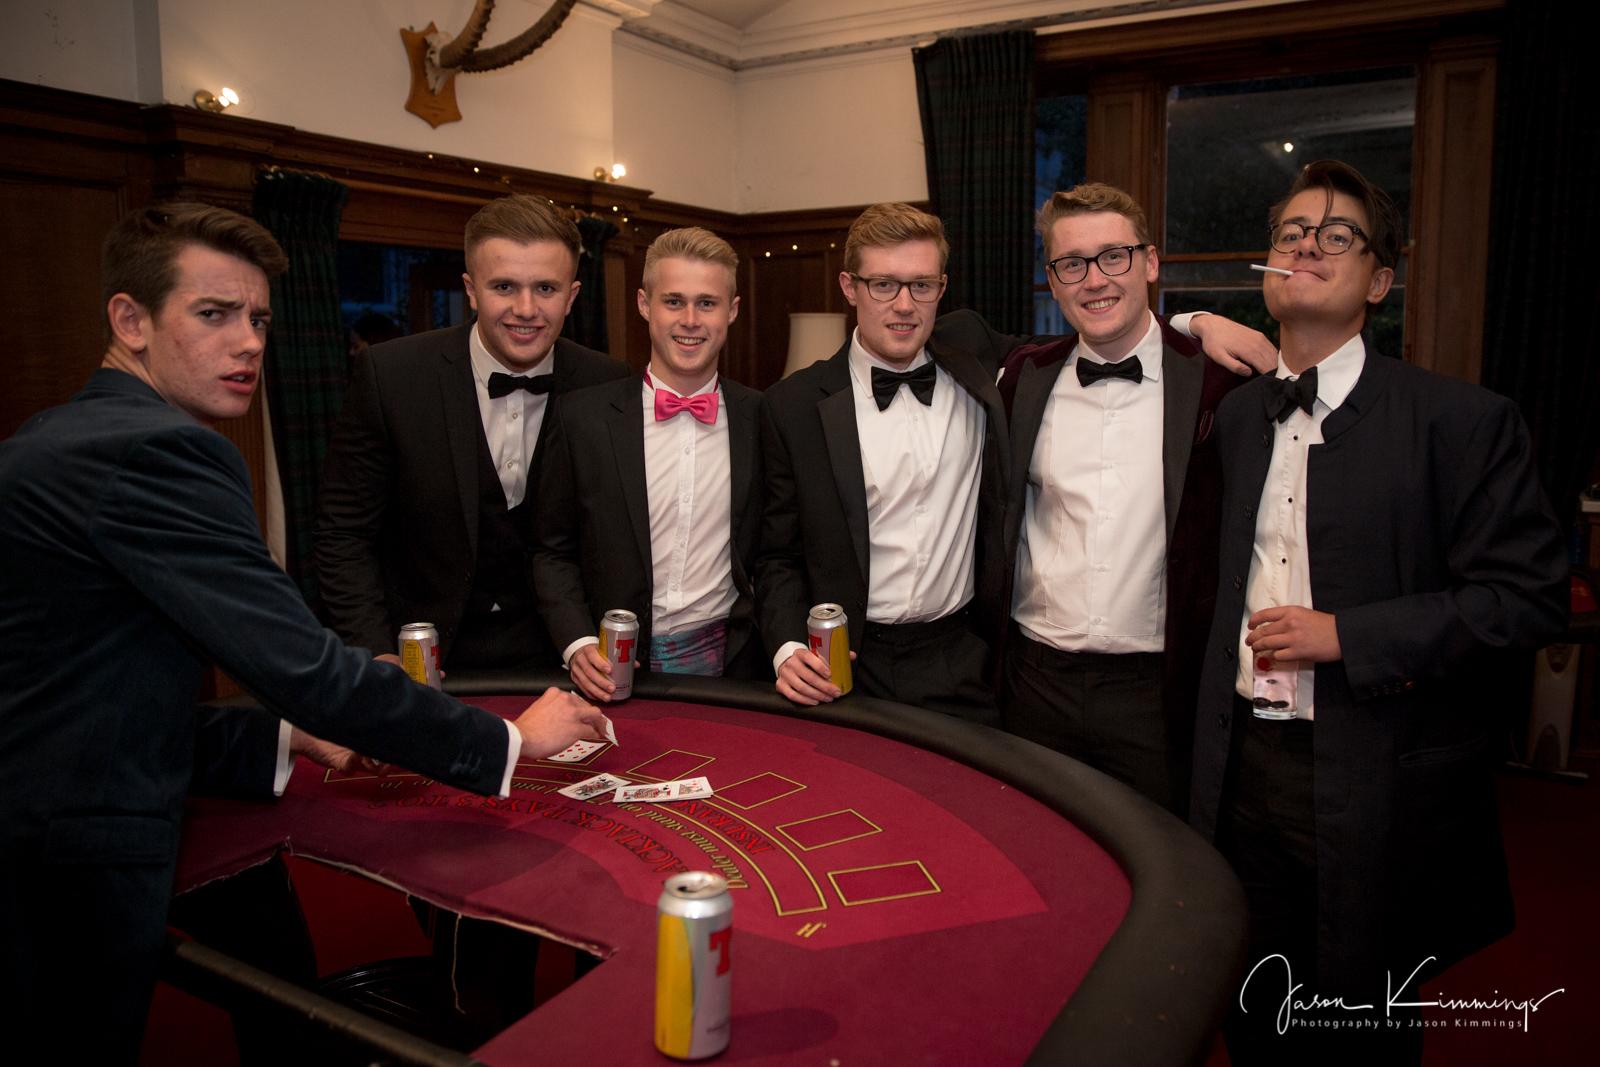 Party-event-photography-west-lothian-edinburgh-glasgow-8.jpg